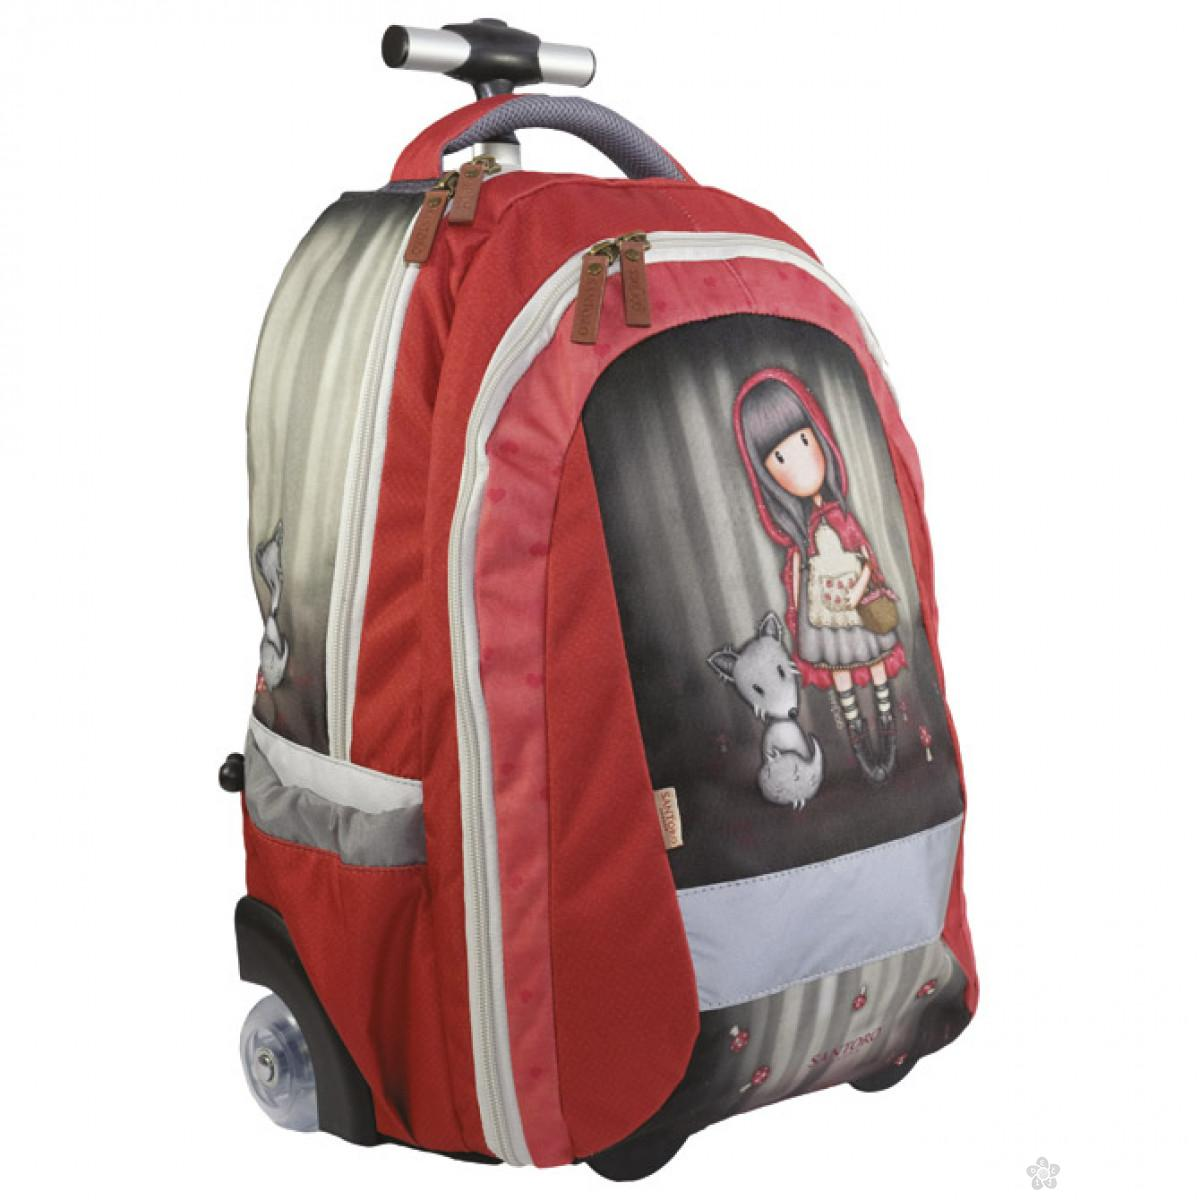 Gorjuss ranac sa točkićima Little Red Riding Hood G4193023